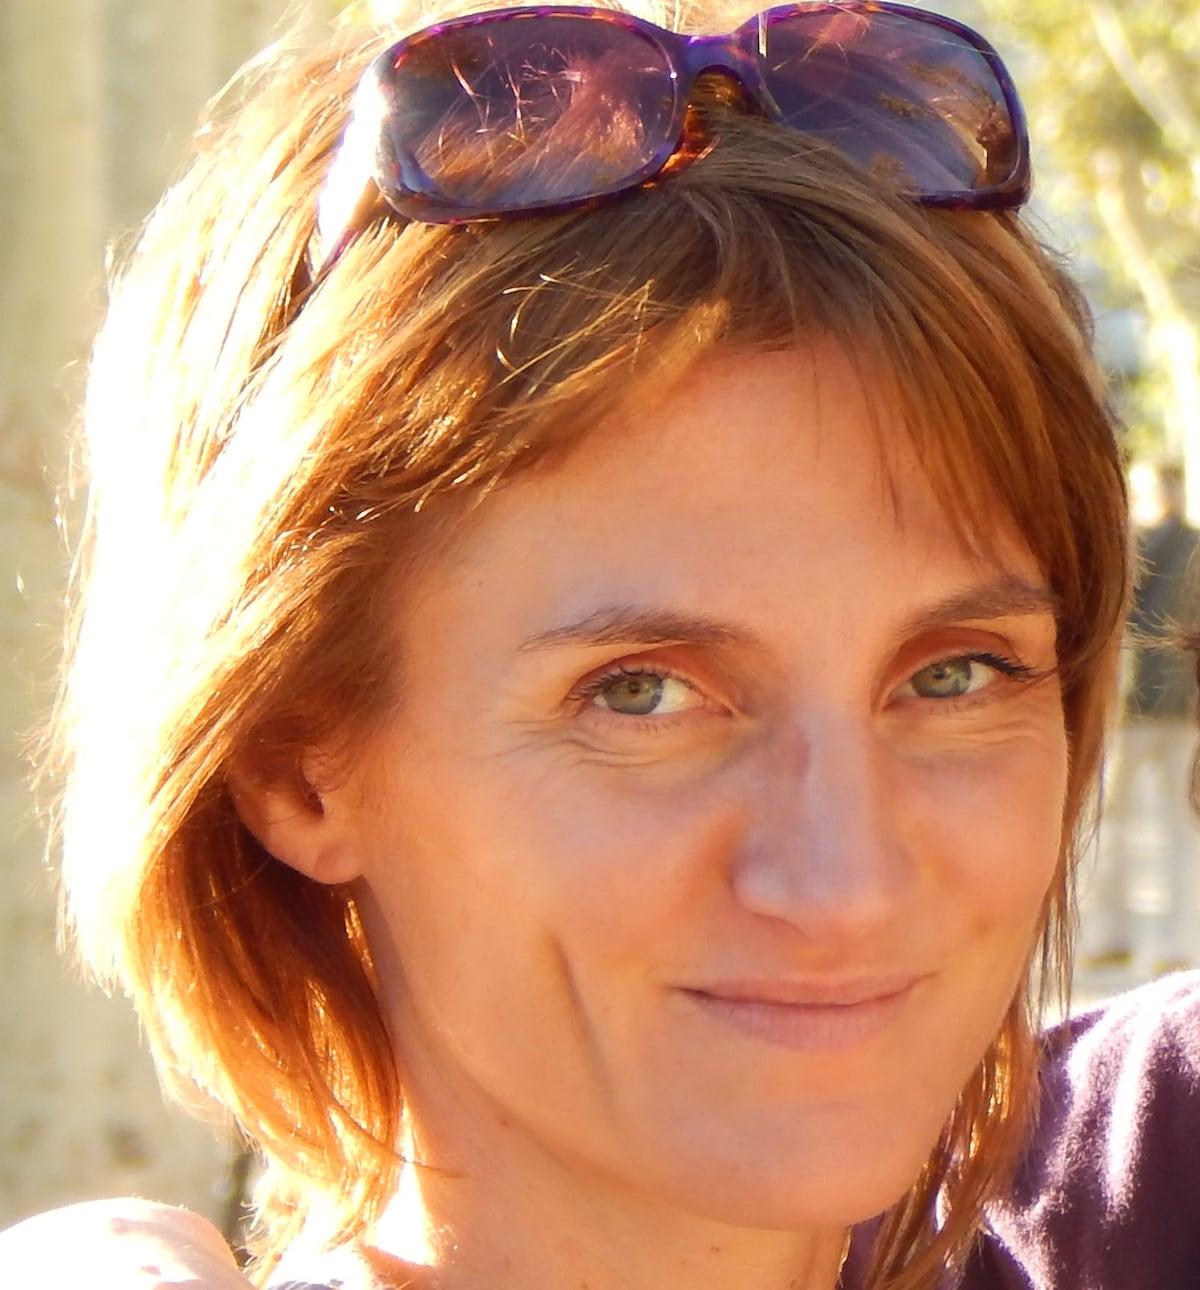 Saskia from Port-Vendres